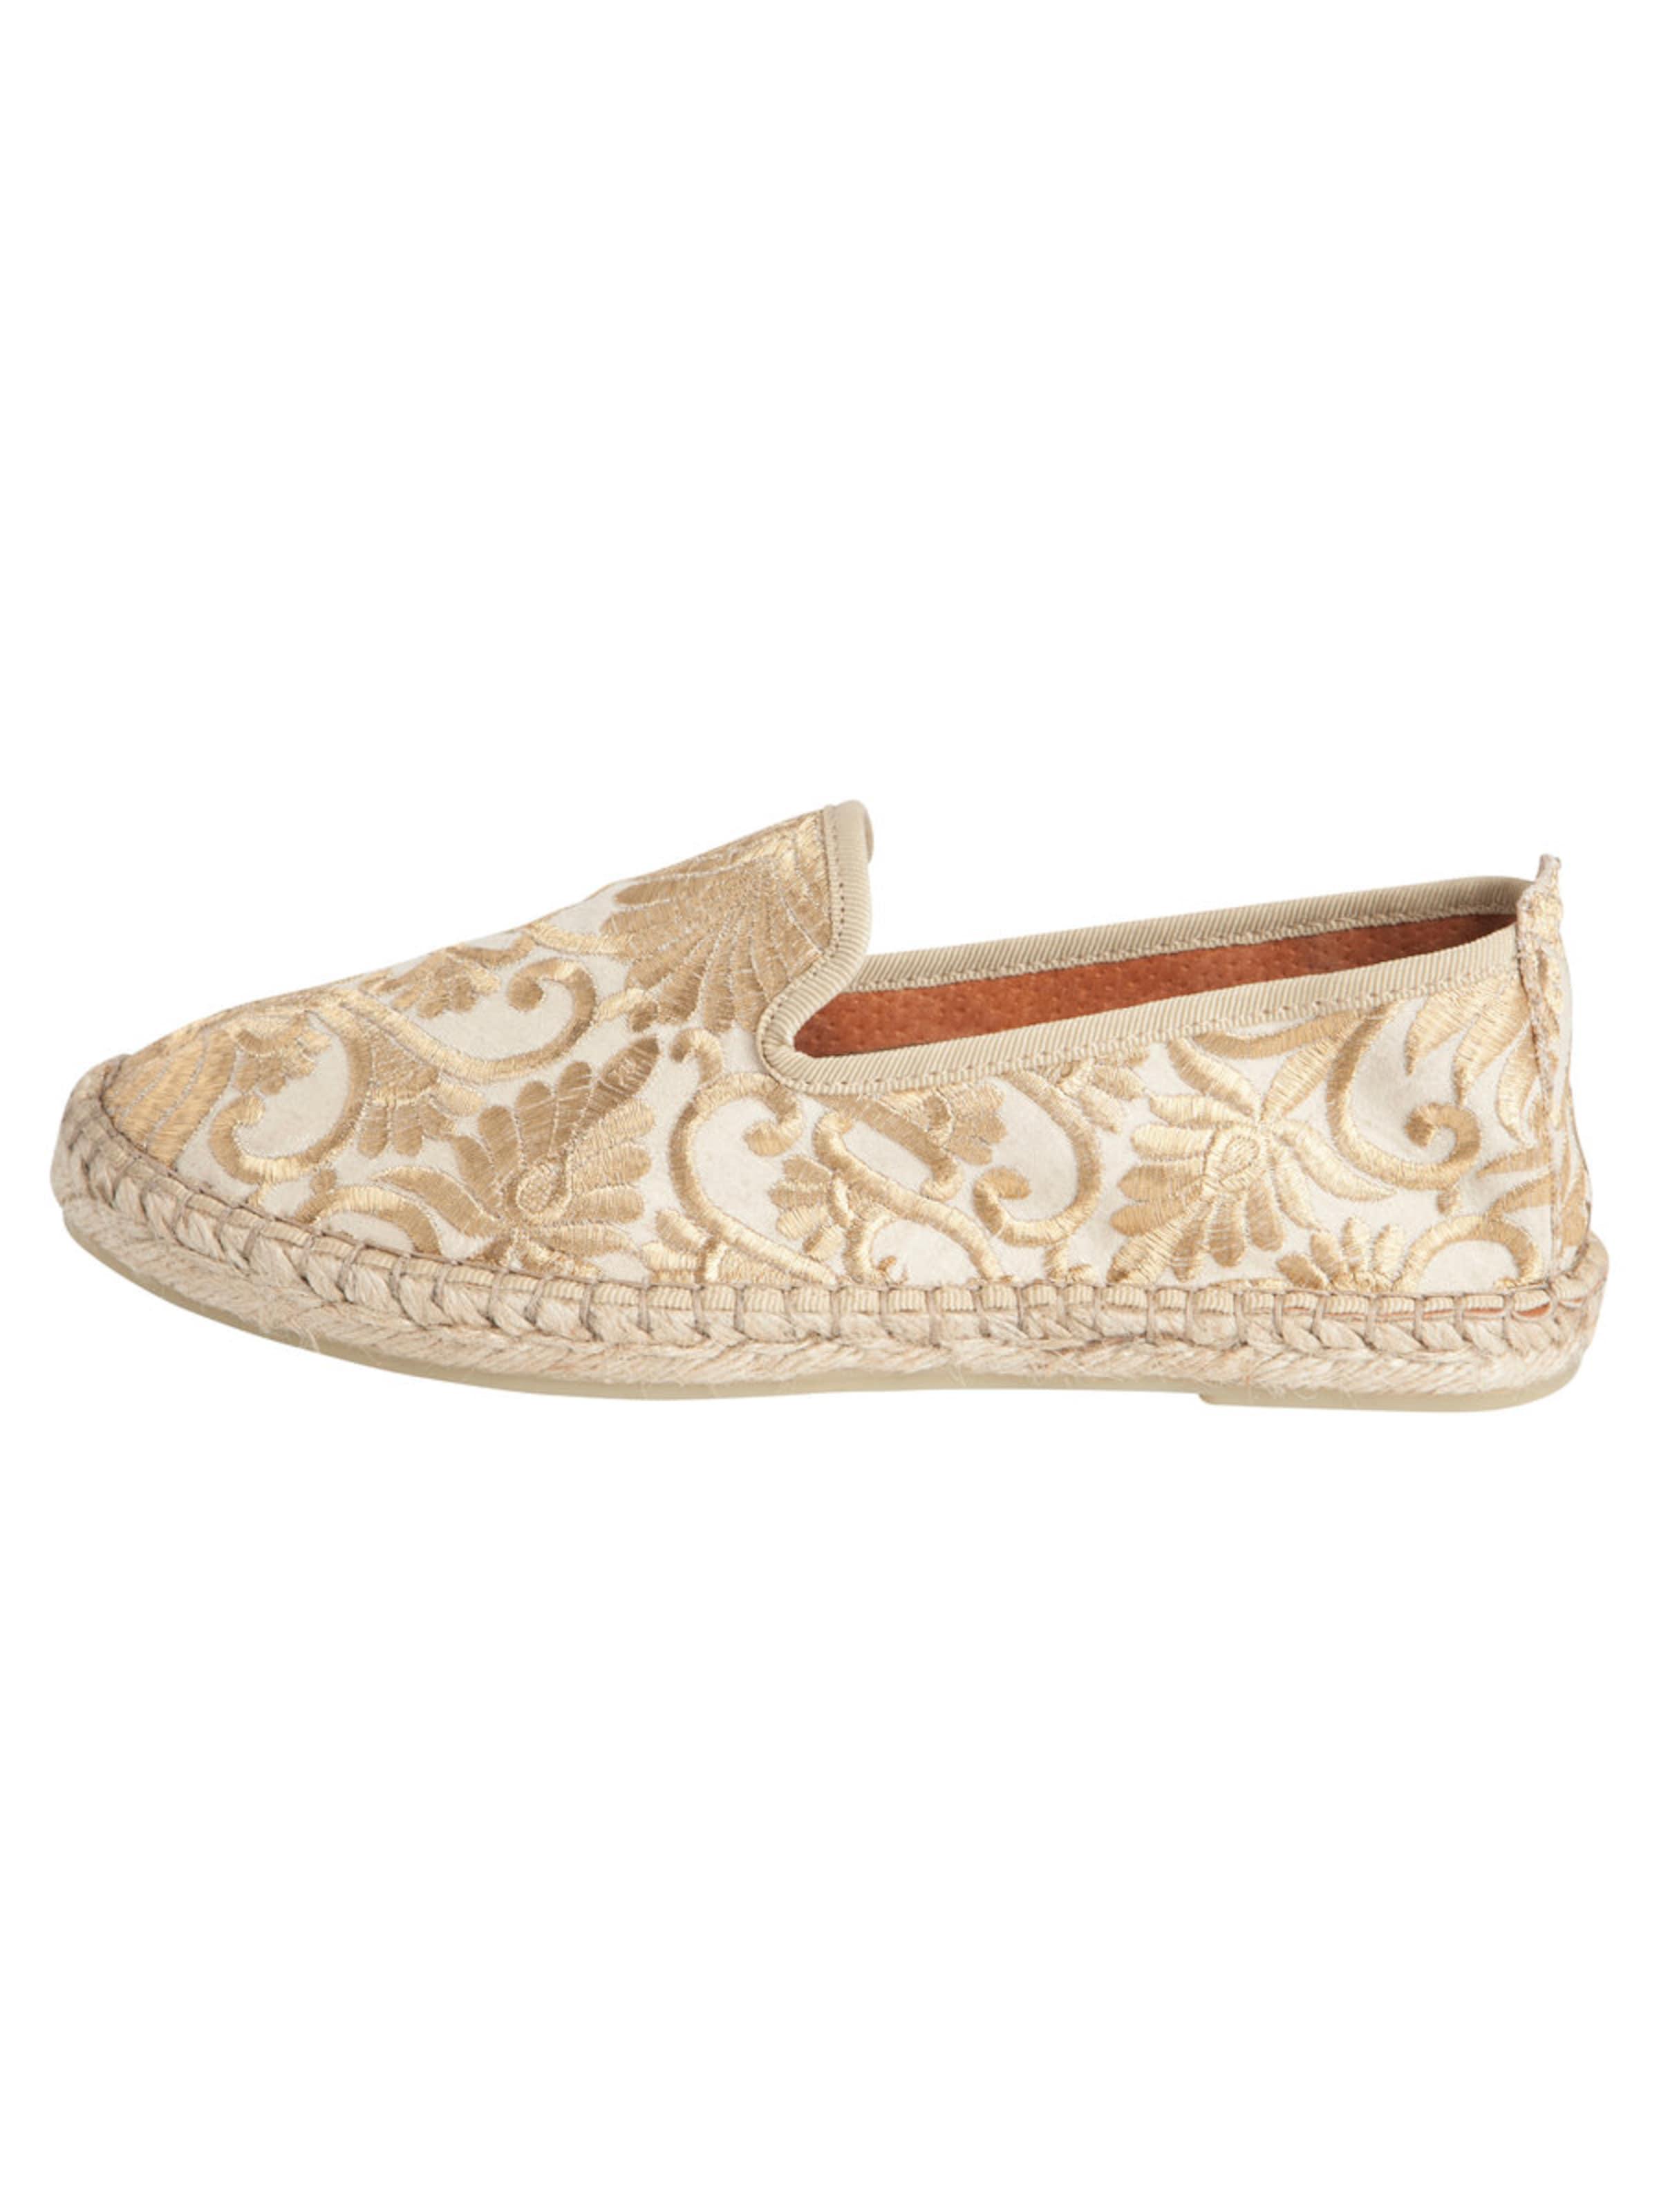 Haltbare Mode billige Schuhe PIECES   Stickerei Espadrilles Schuhe Gut getragene Schuhe